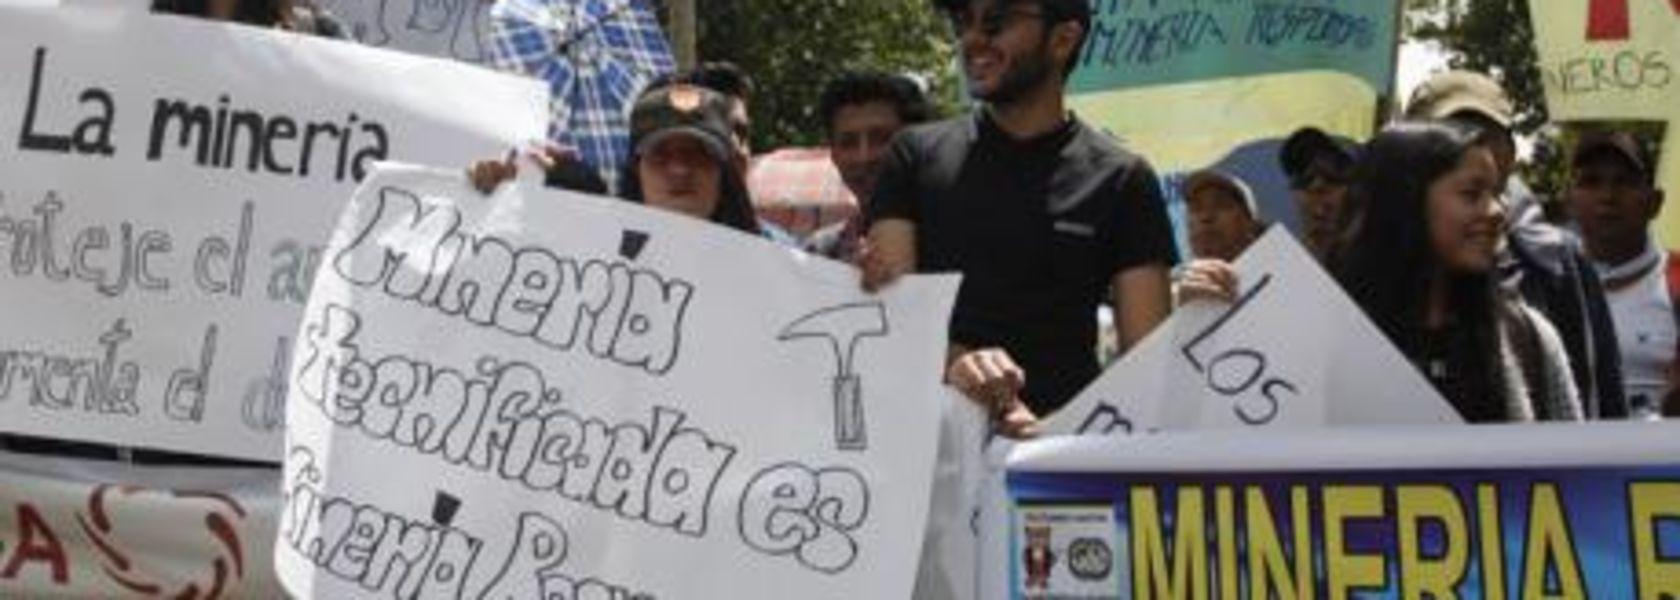 Ecuador court hears case for referendum - Mining Journal